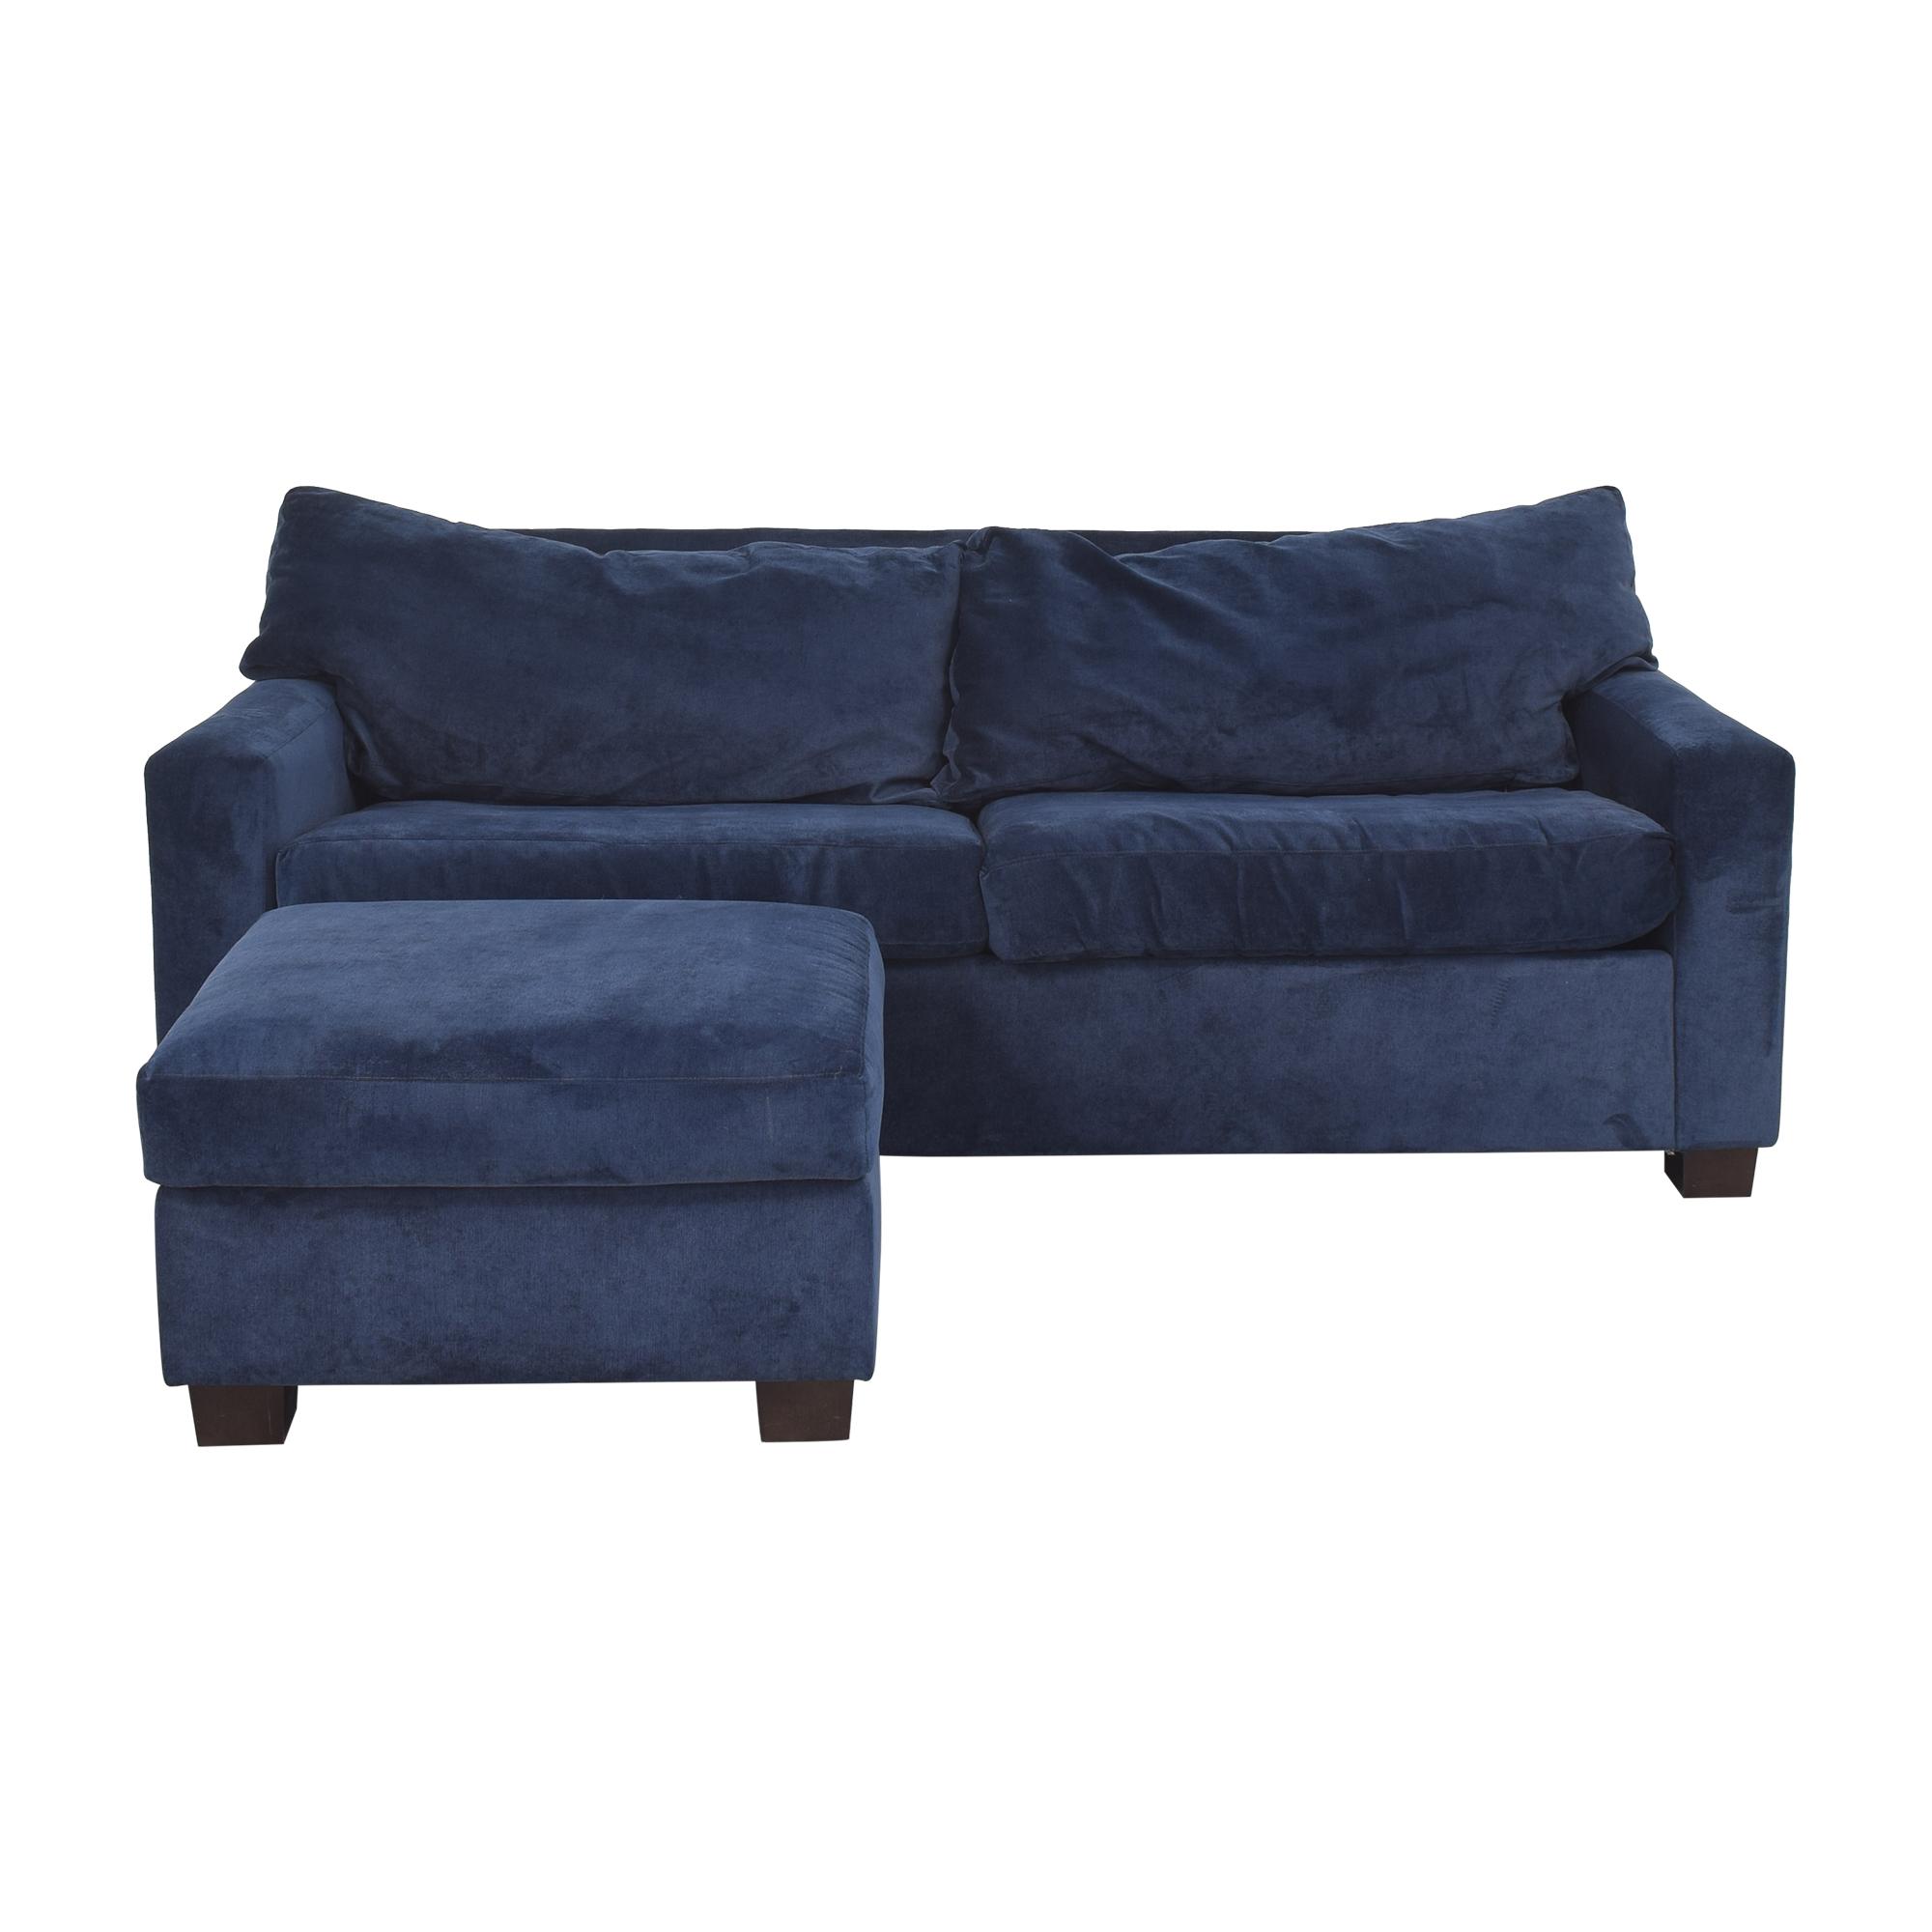 Mitchell Gold + Bob Williams Sleeper Sofa & Ottoman / Sofa Beds